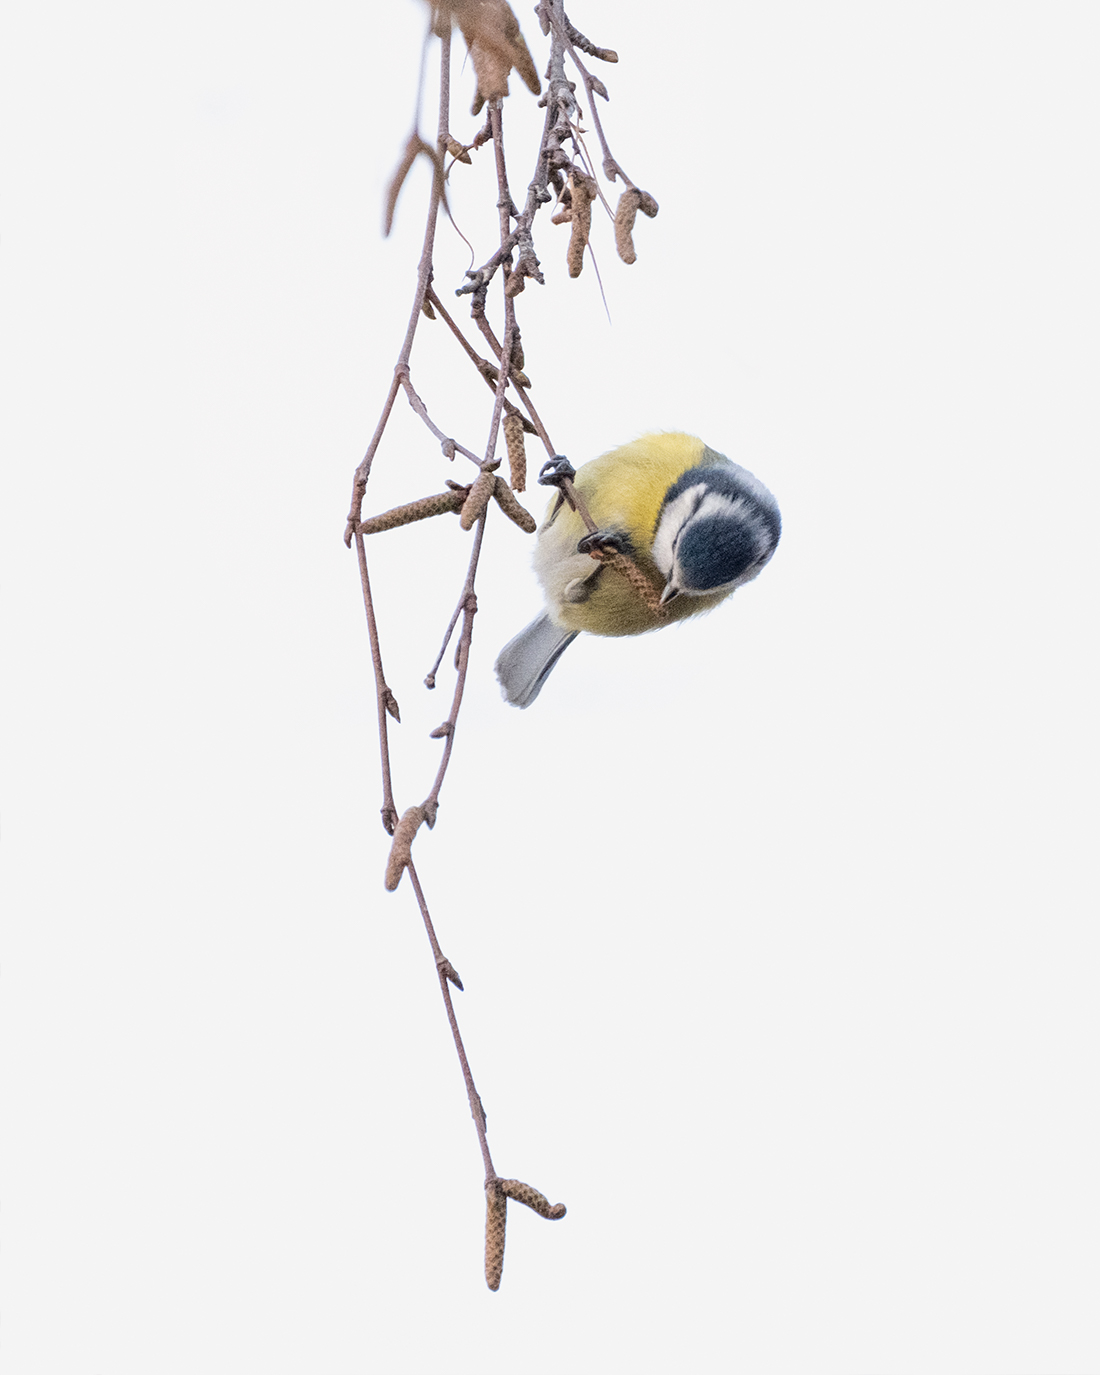 DSCF8319-1-WEB-blåmeis-ciliestad-trondheim-fuglefoto